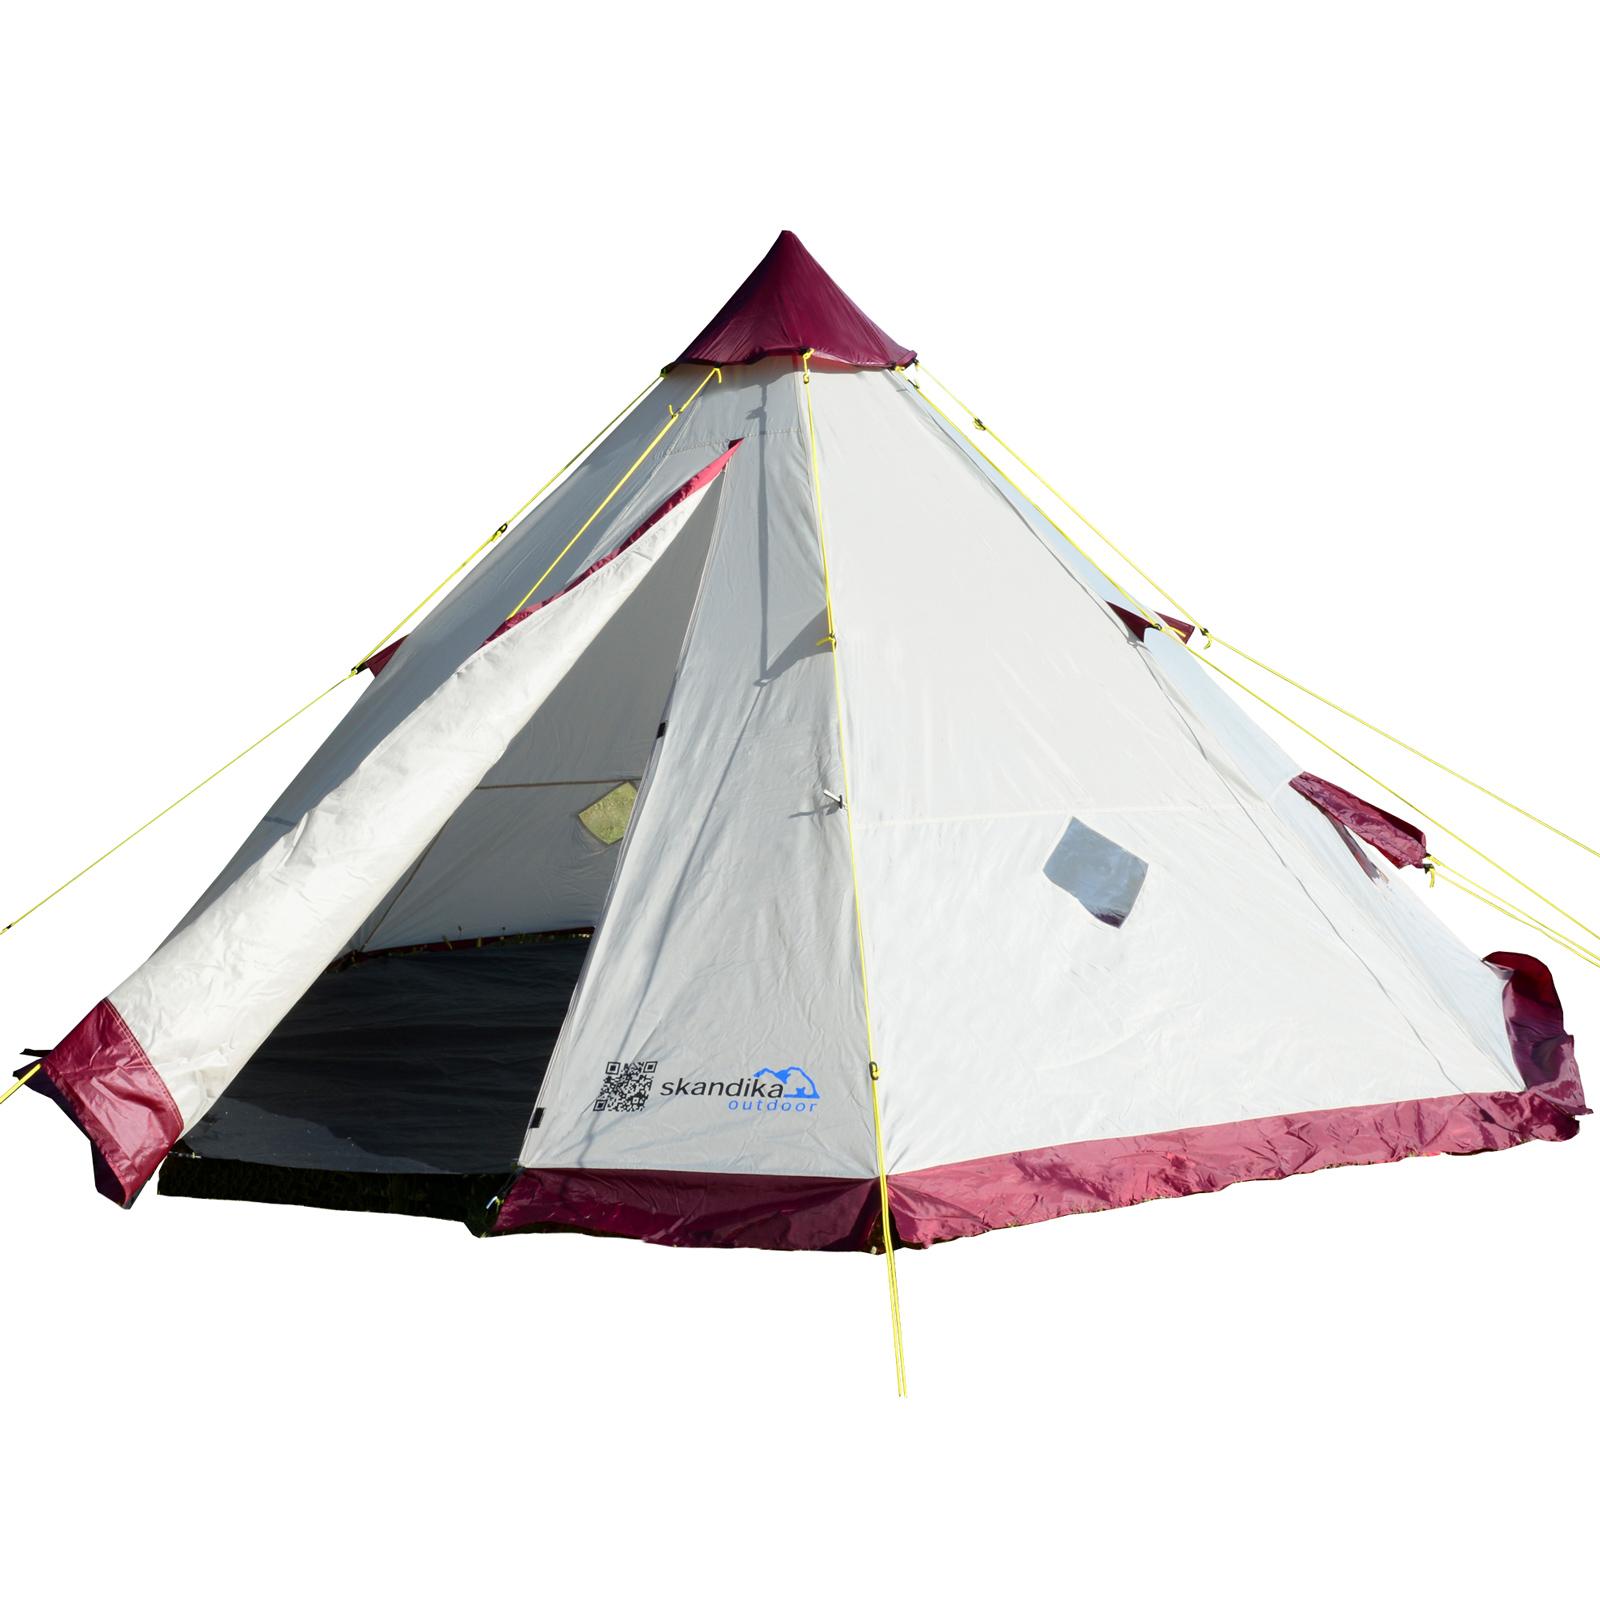 wigwam tipi indianerzelt skandika tipii 200 6 personnen teepee pyramidenzelt max trader gmbh. Black Bedroom Furniture Sets. Home Design Ideas